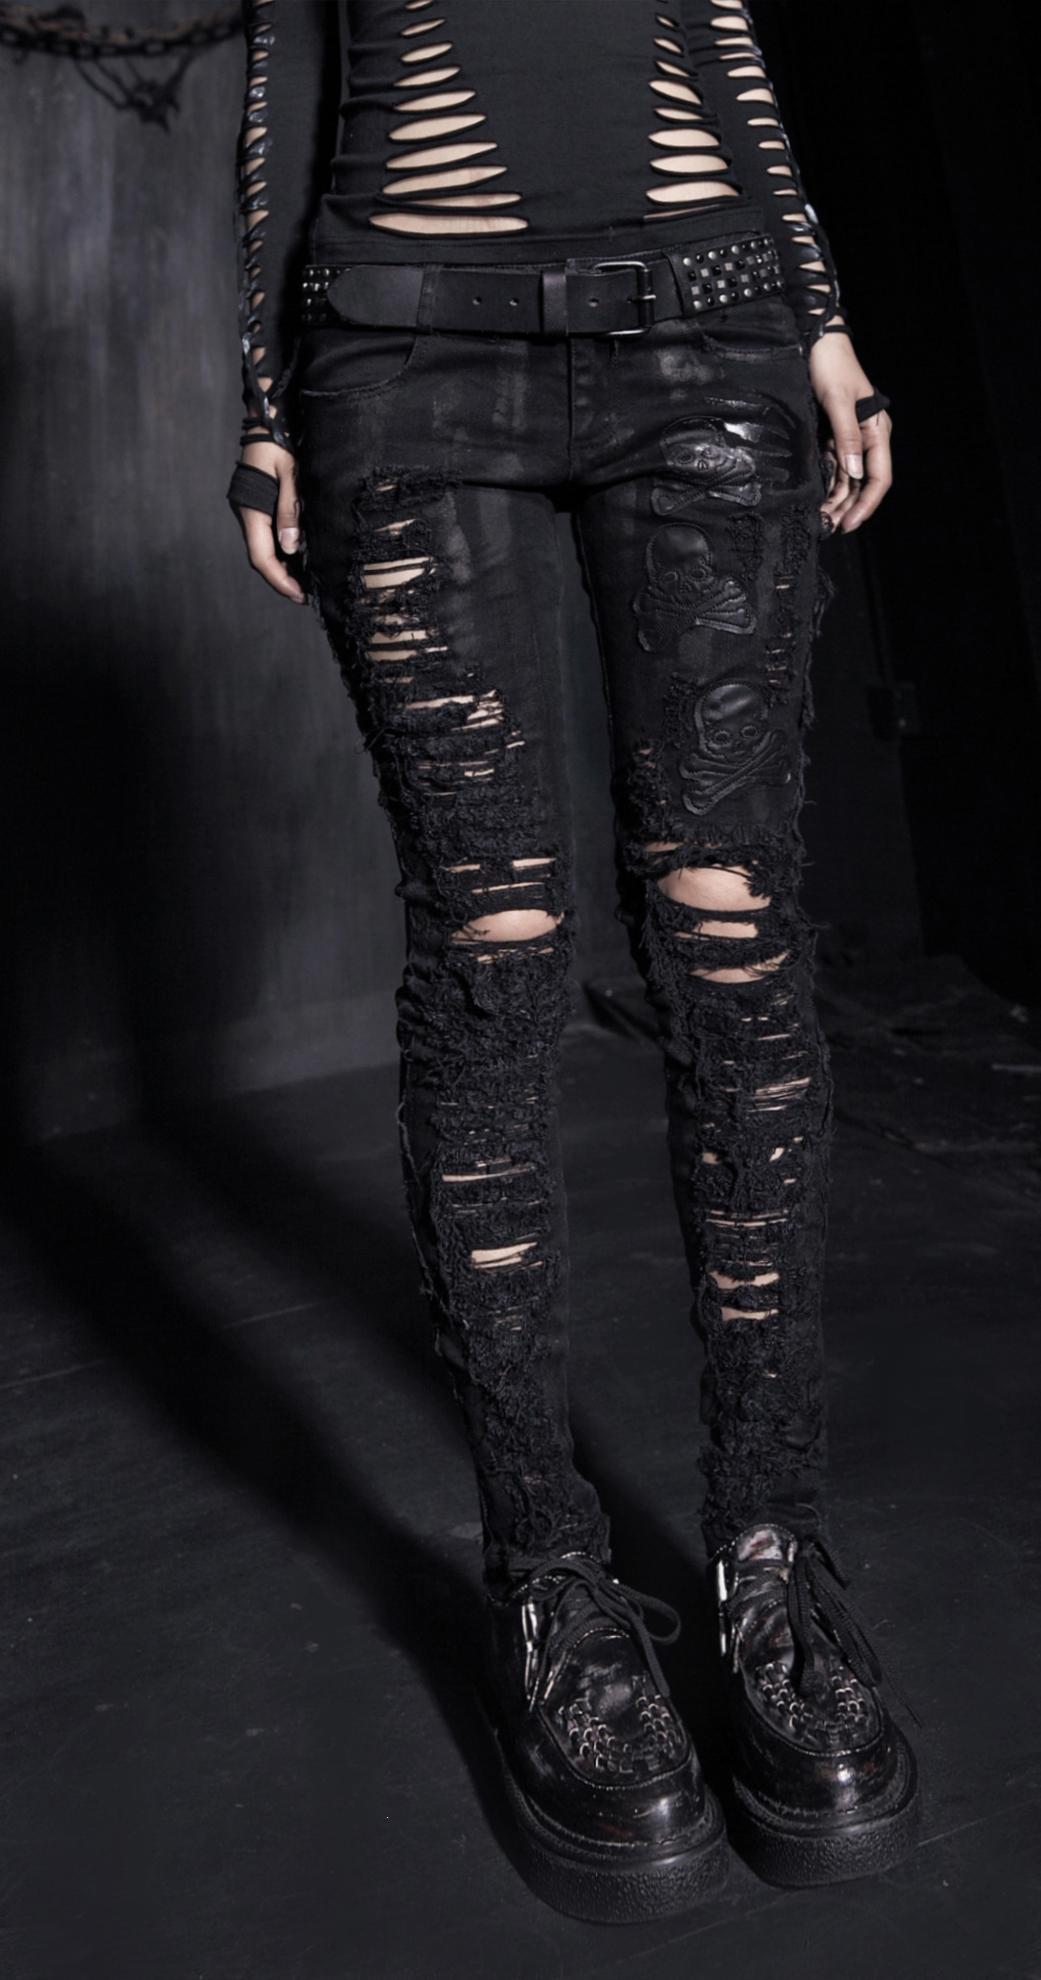 rebelsmarket_ladies_black_ripped_gothic_skull_print_skinny_jeans_industrial_trousers_pants_and_jeans_5.jpg